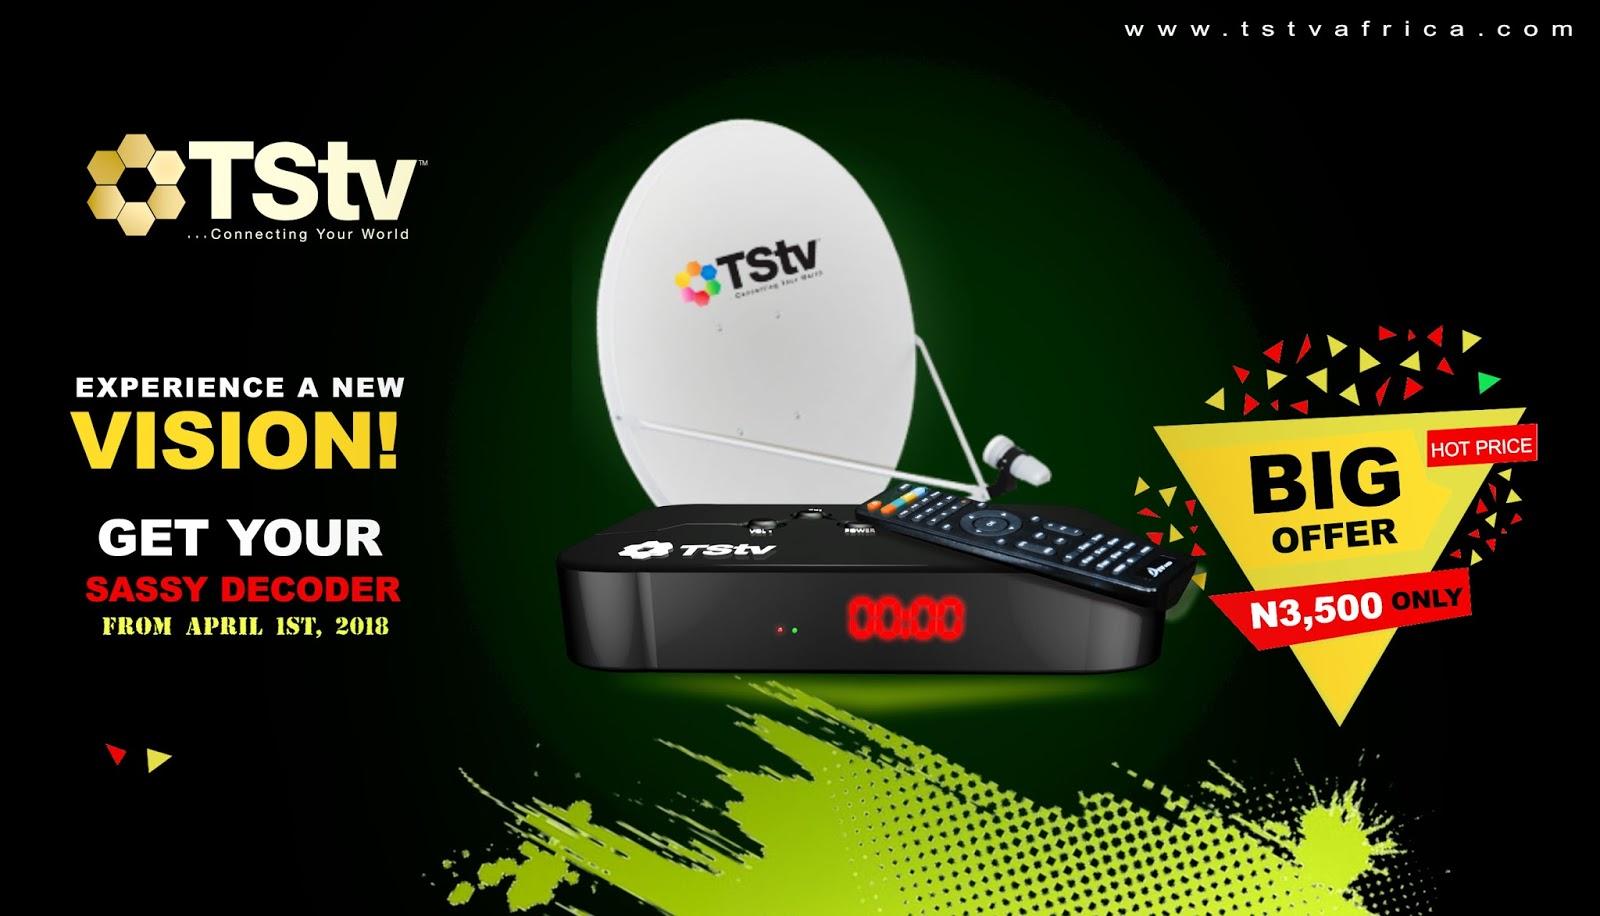 Photo of TSTV: Where To Buy TSTV Sassy Decoder In Anambra, Nigeria